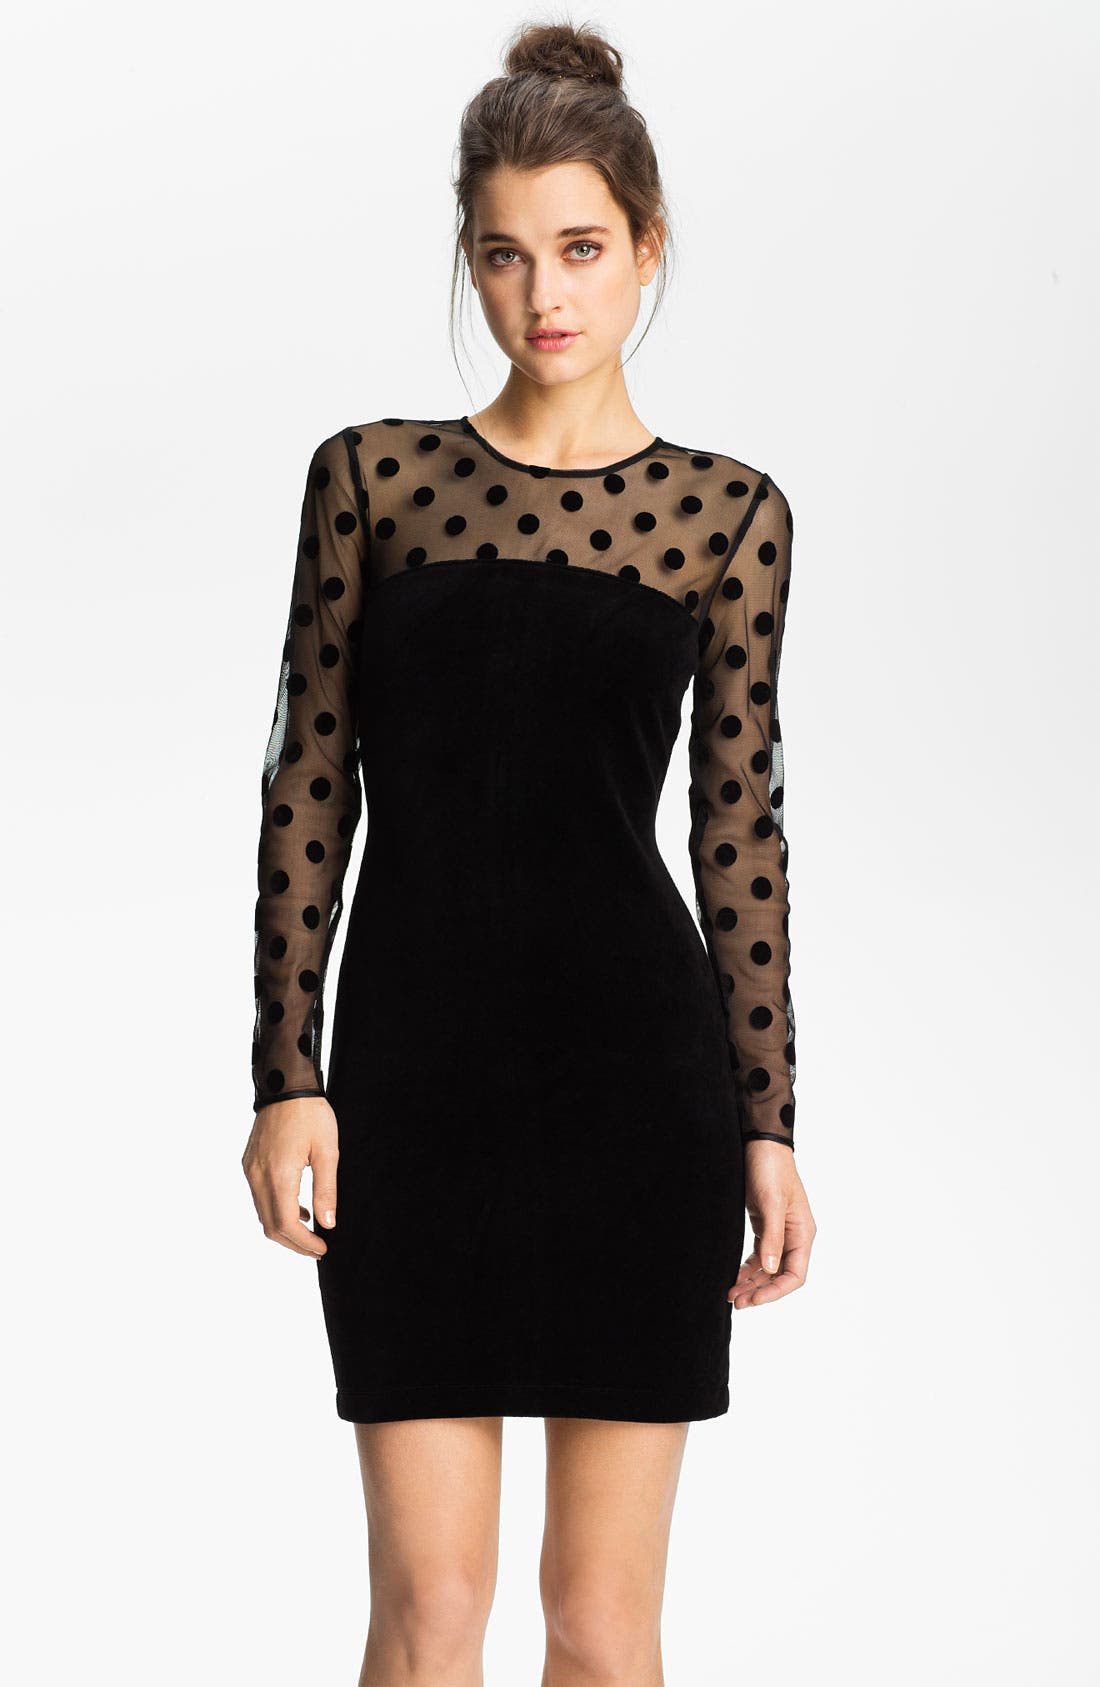 Main Image - Juicy Couture Sheer Polka Dot & Velvet Dress